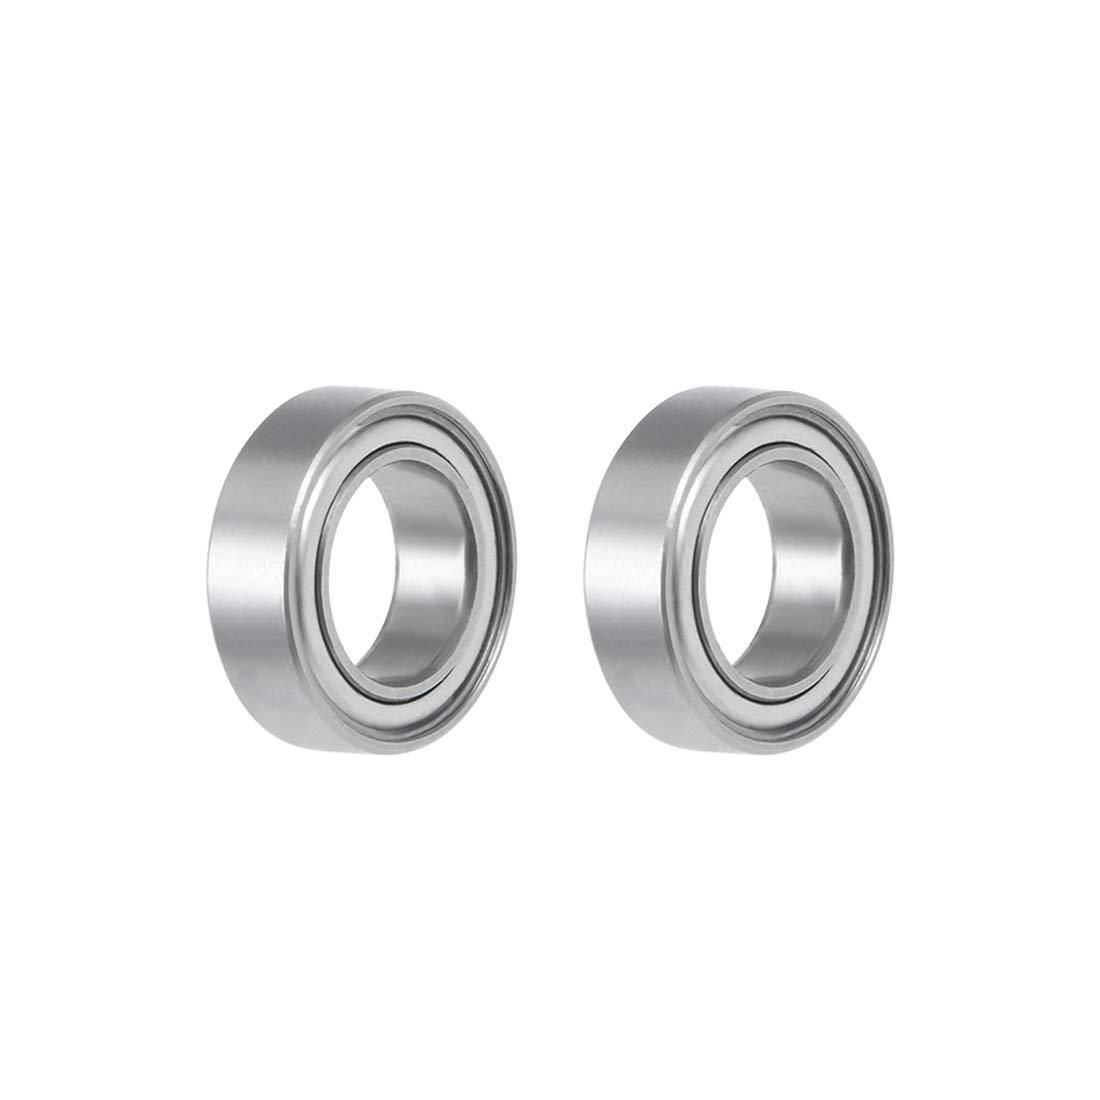 2 PCS ABEC-7 6x10x3 mm 440c Stainless Steel CERAMIC Ball Bearings SMR106-2RS